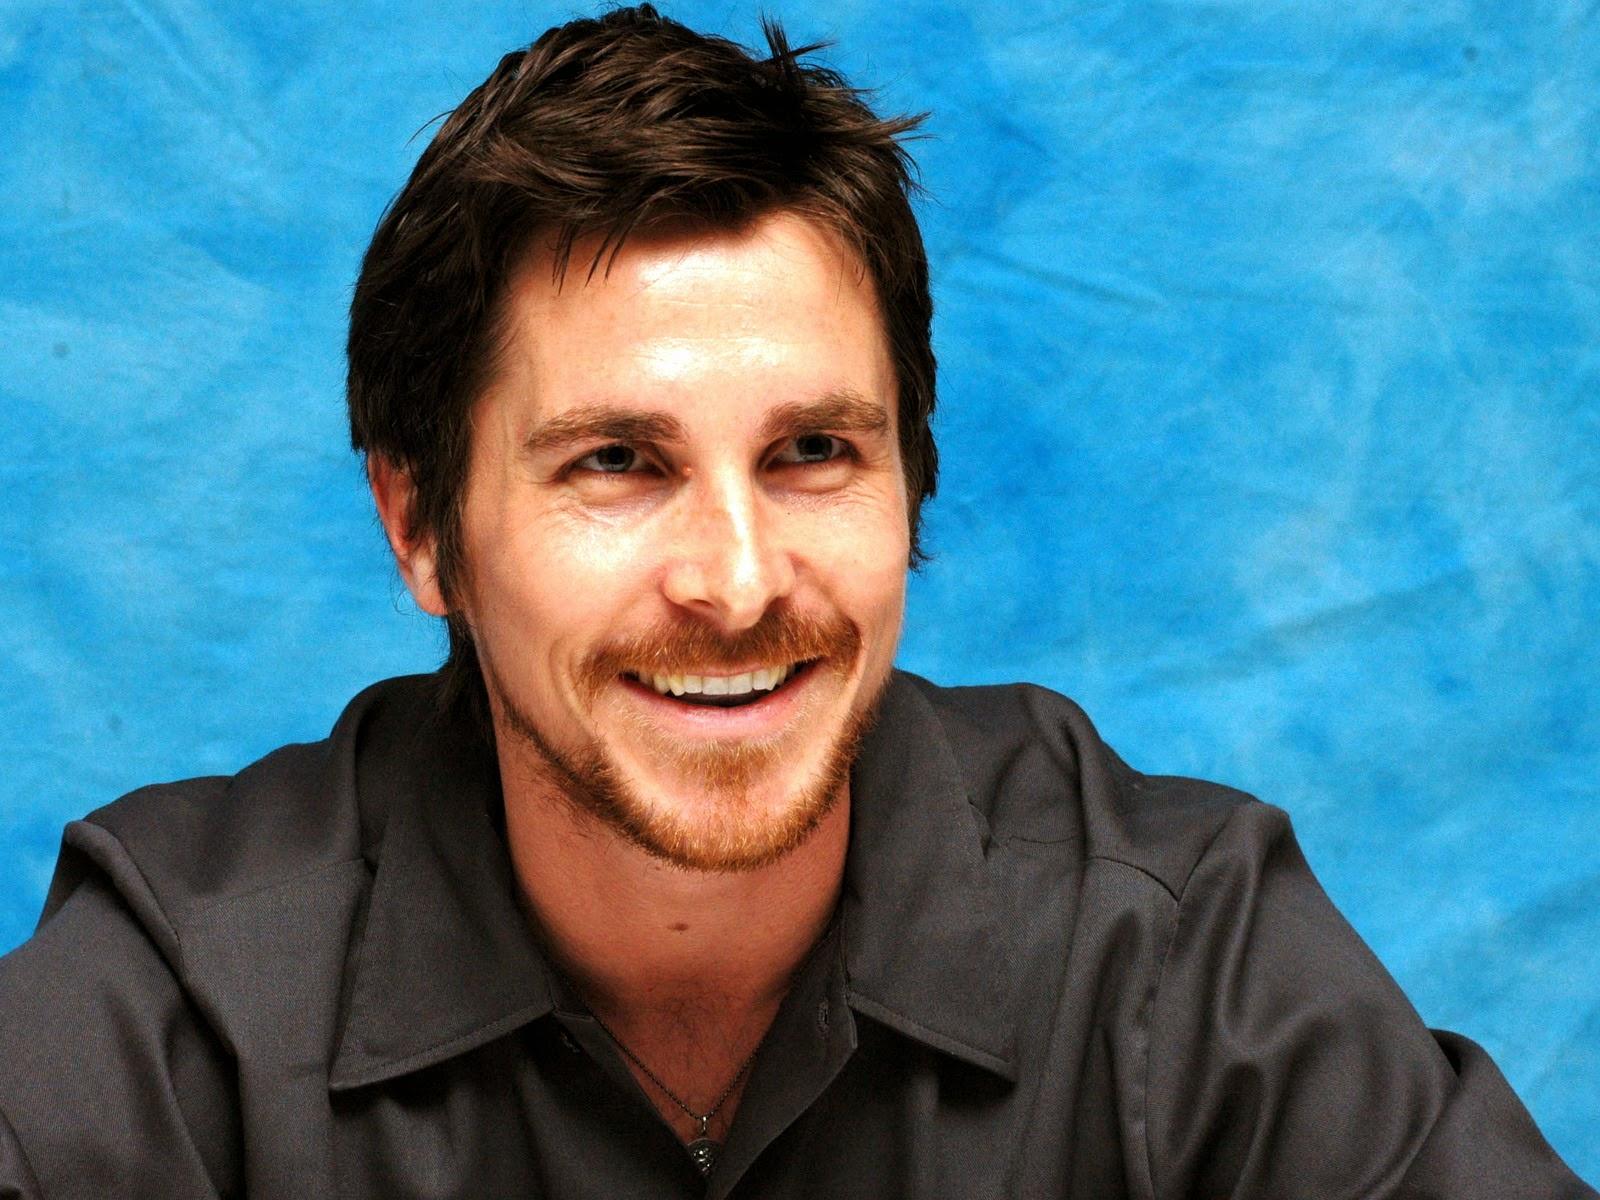 Christian Bale será Steve Jobs. Making Of. MÁS CINE. Noticias